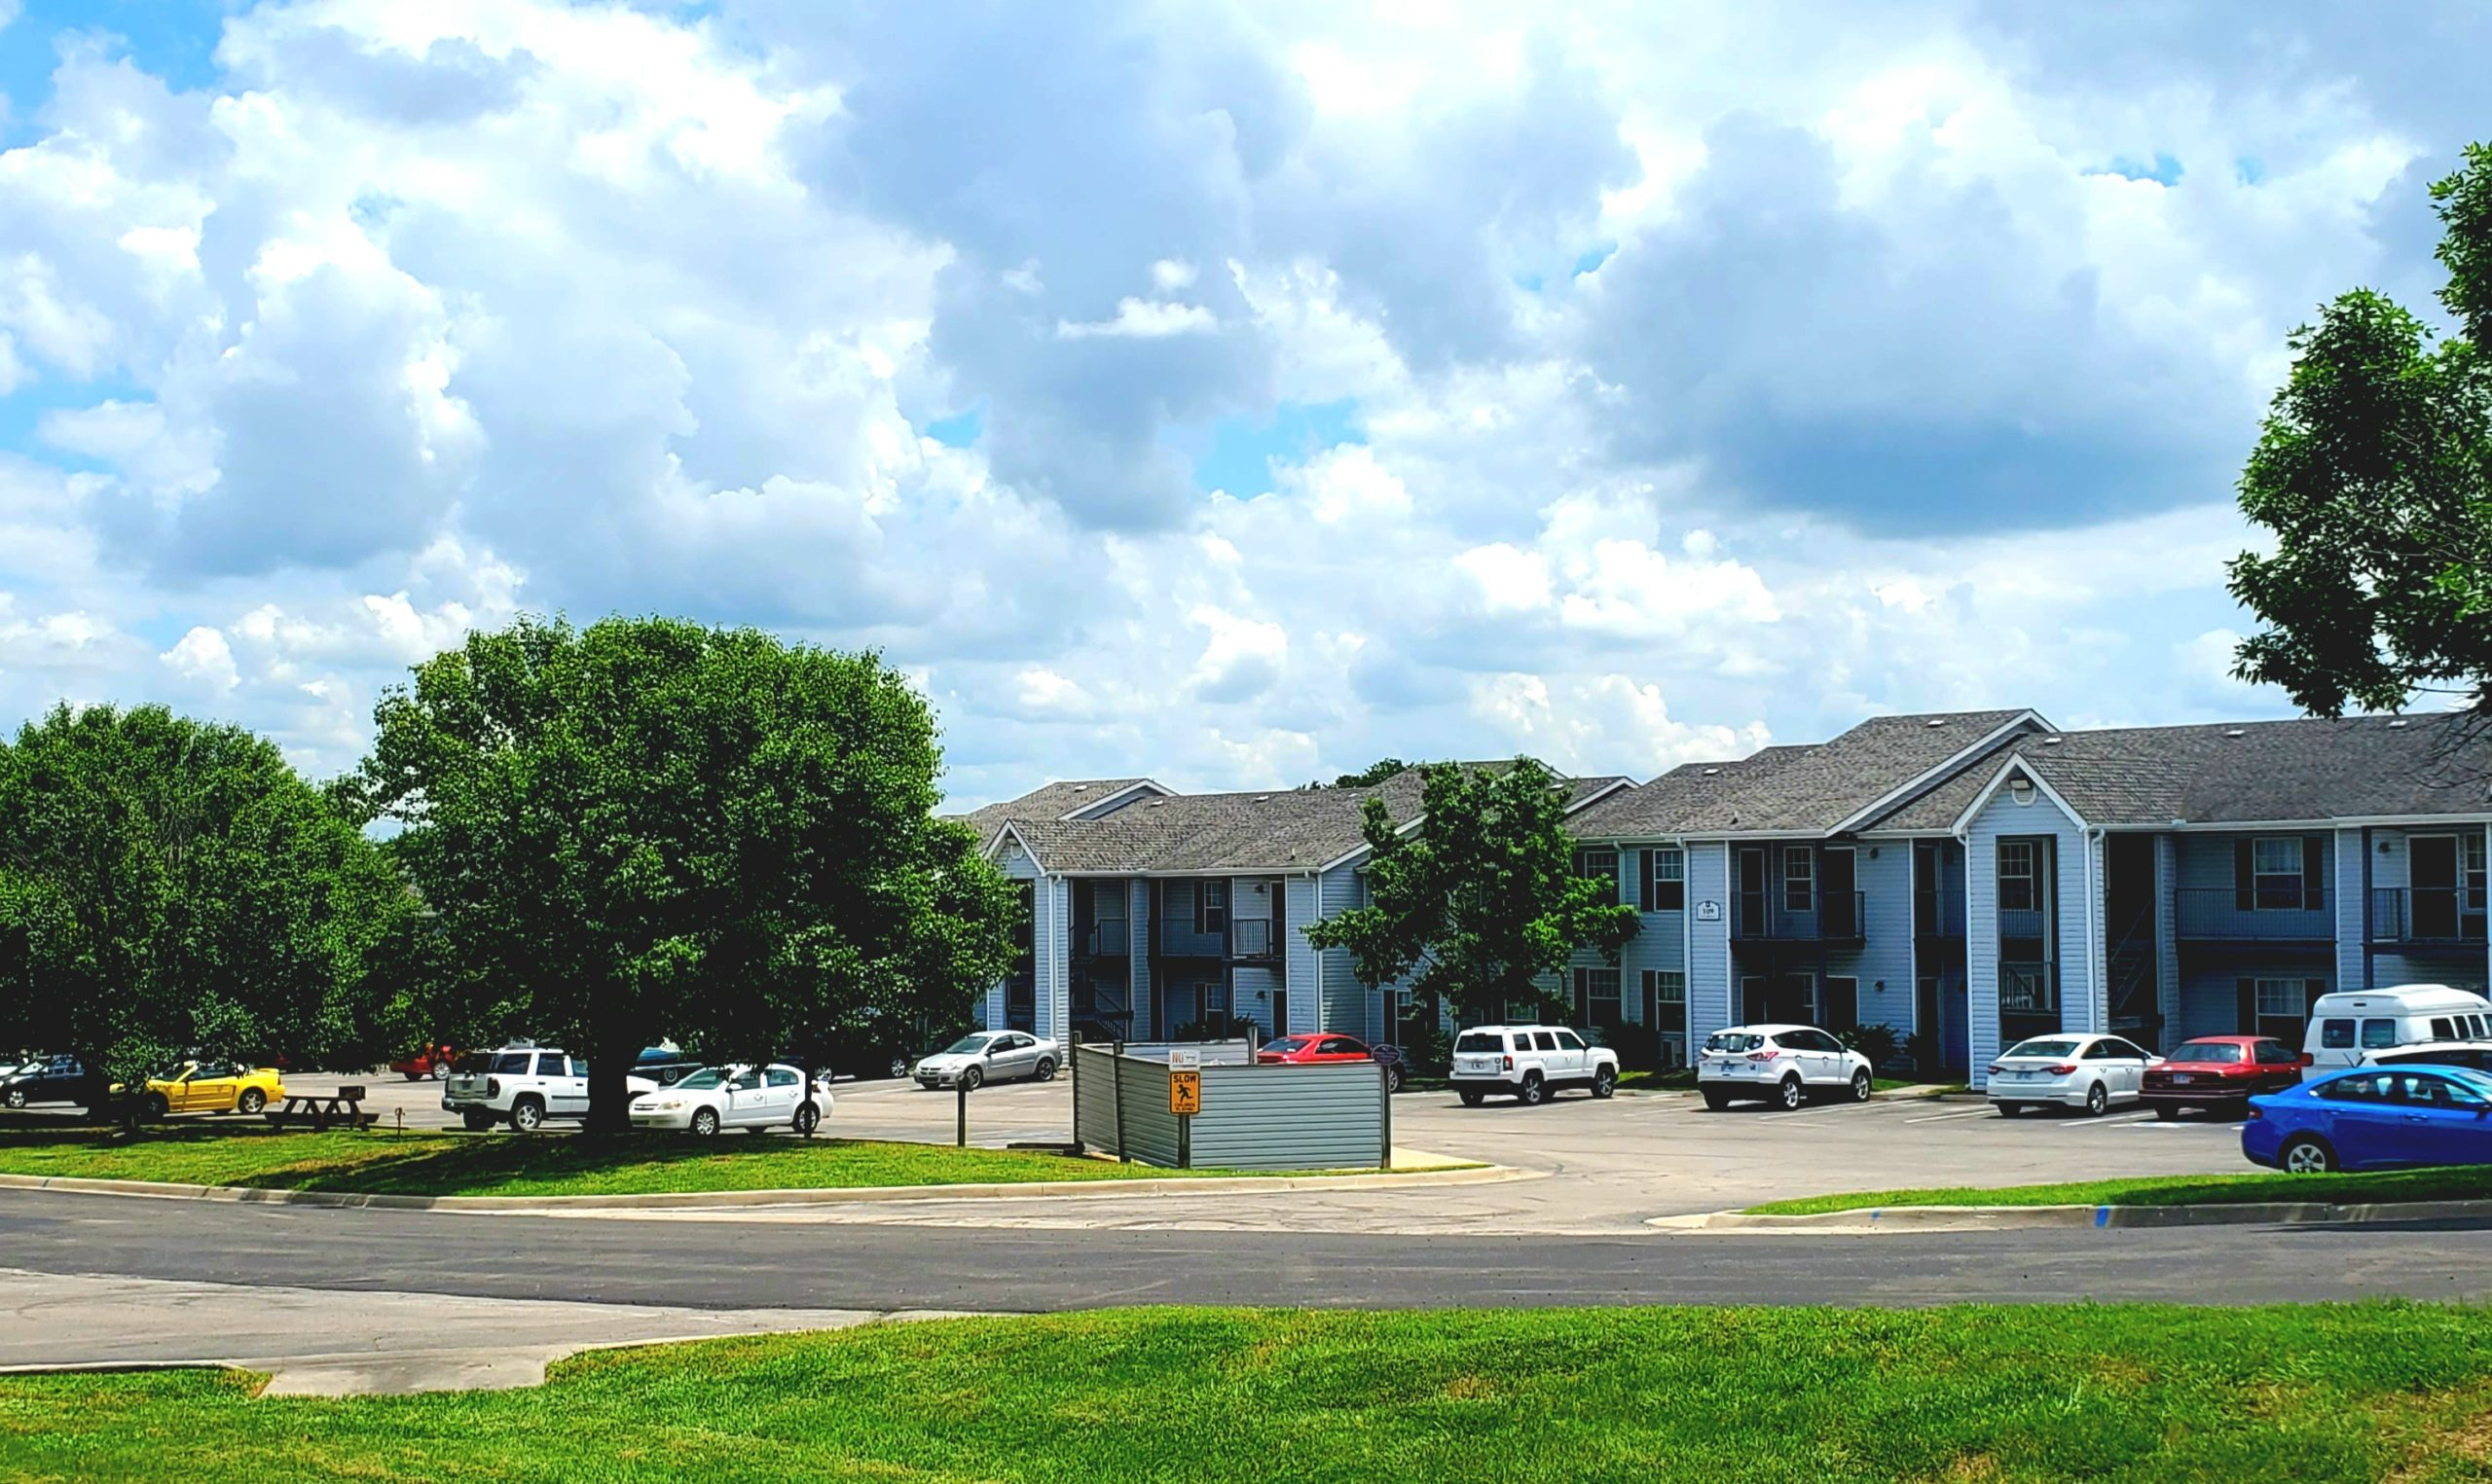 Parkford Apts Iola KS exterior buildings